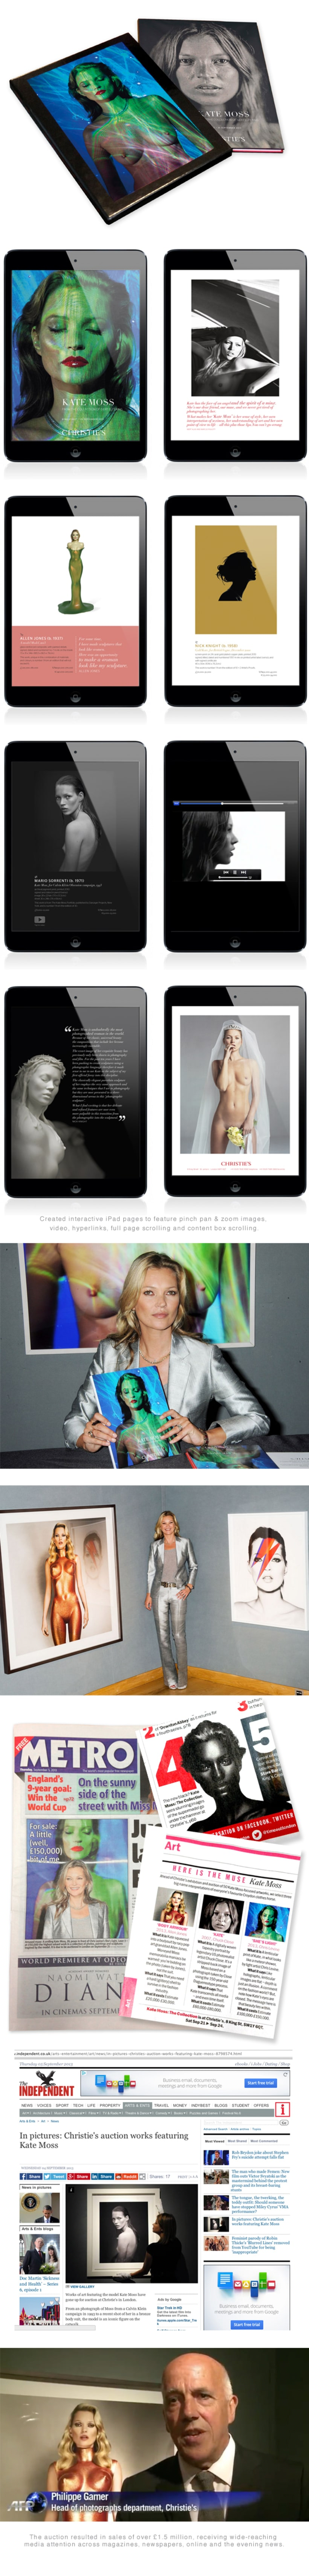 Kate Moss -1